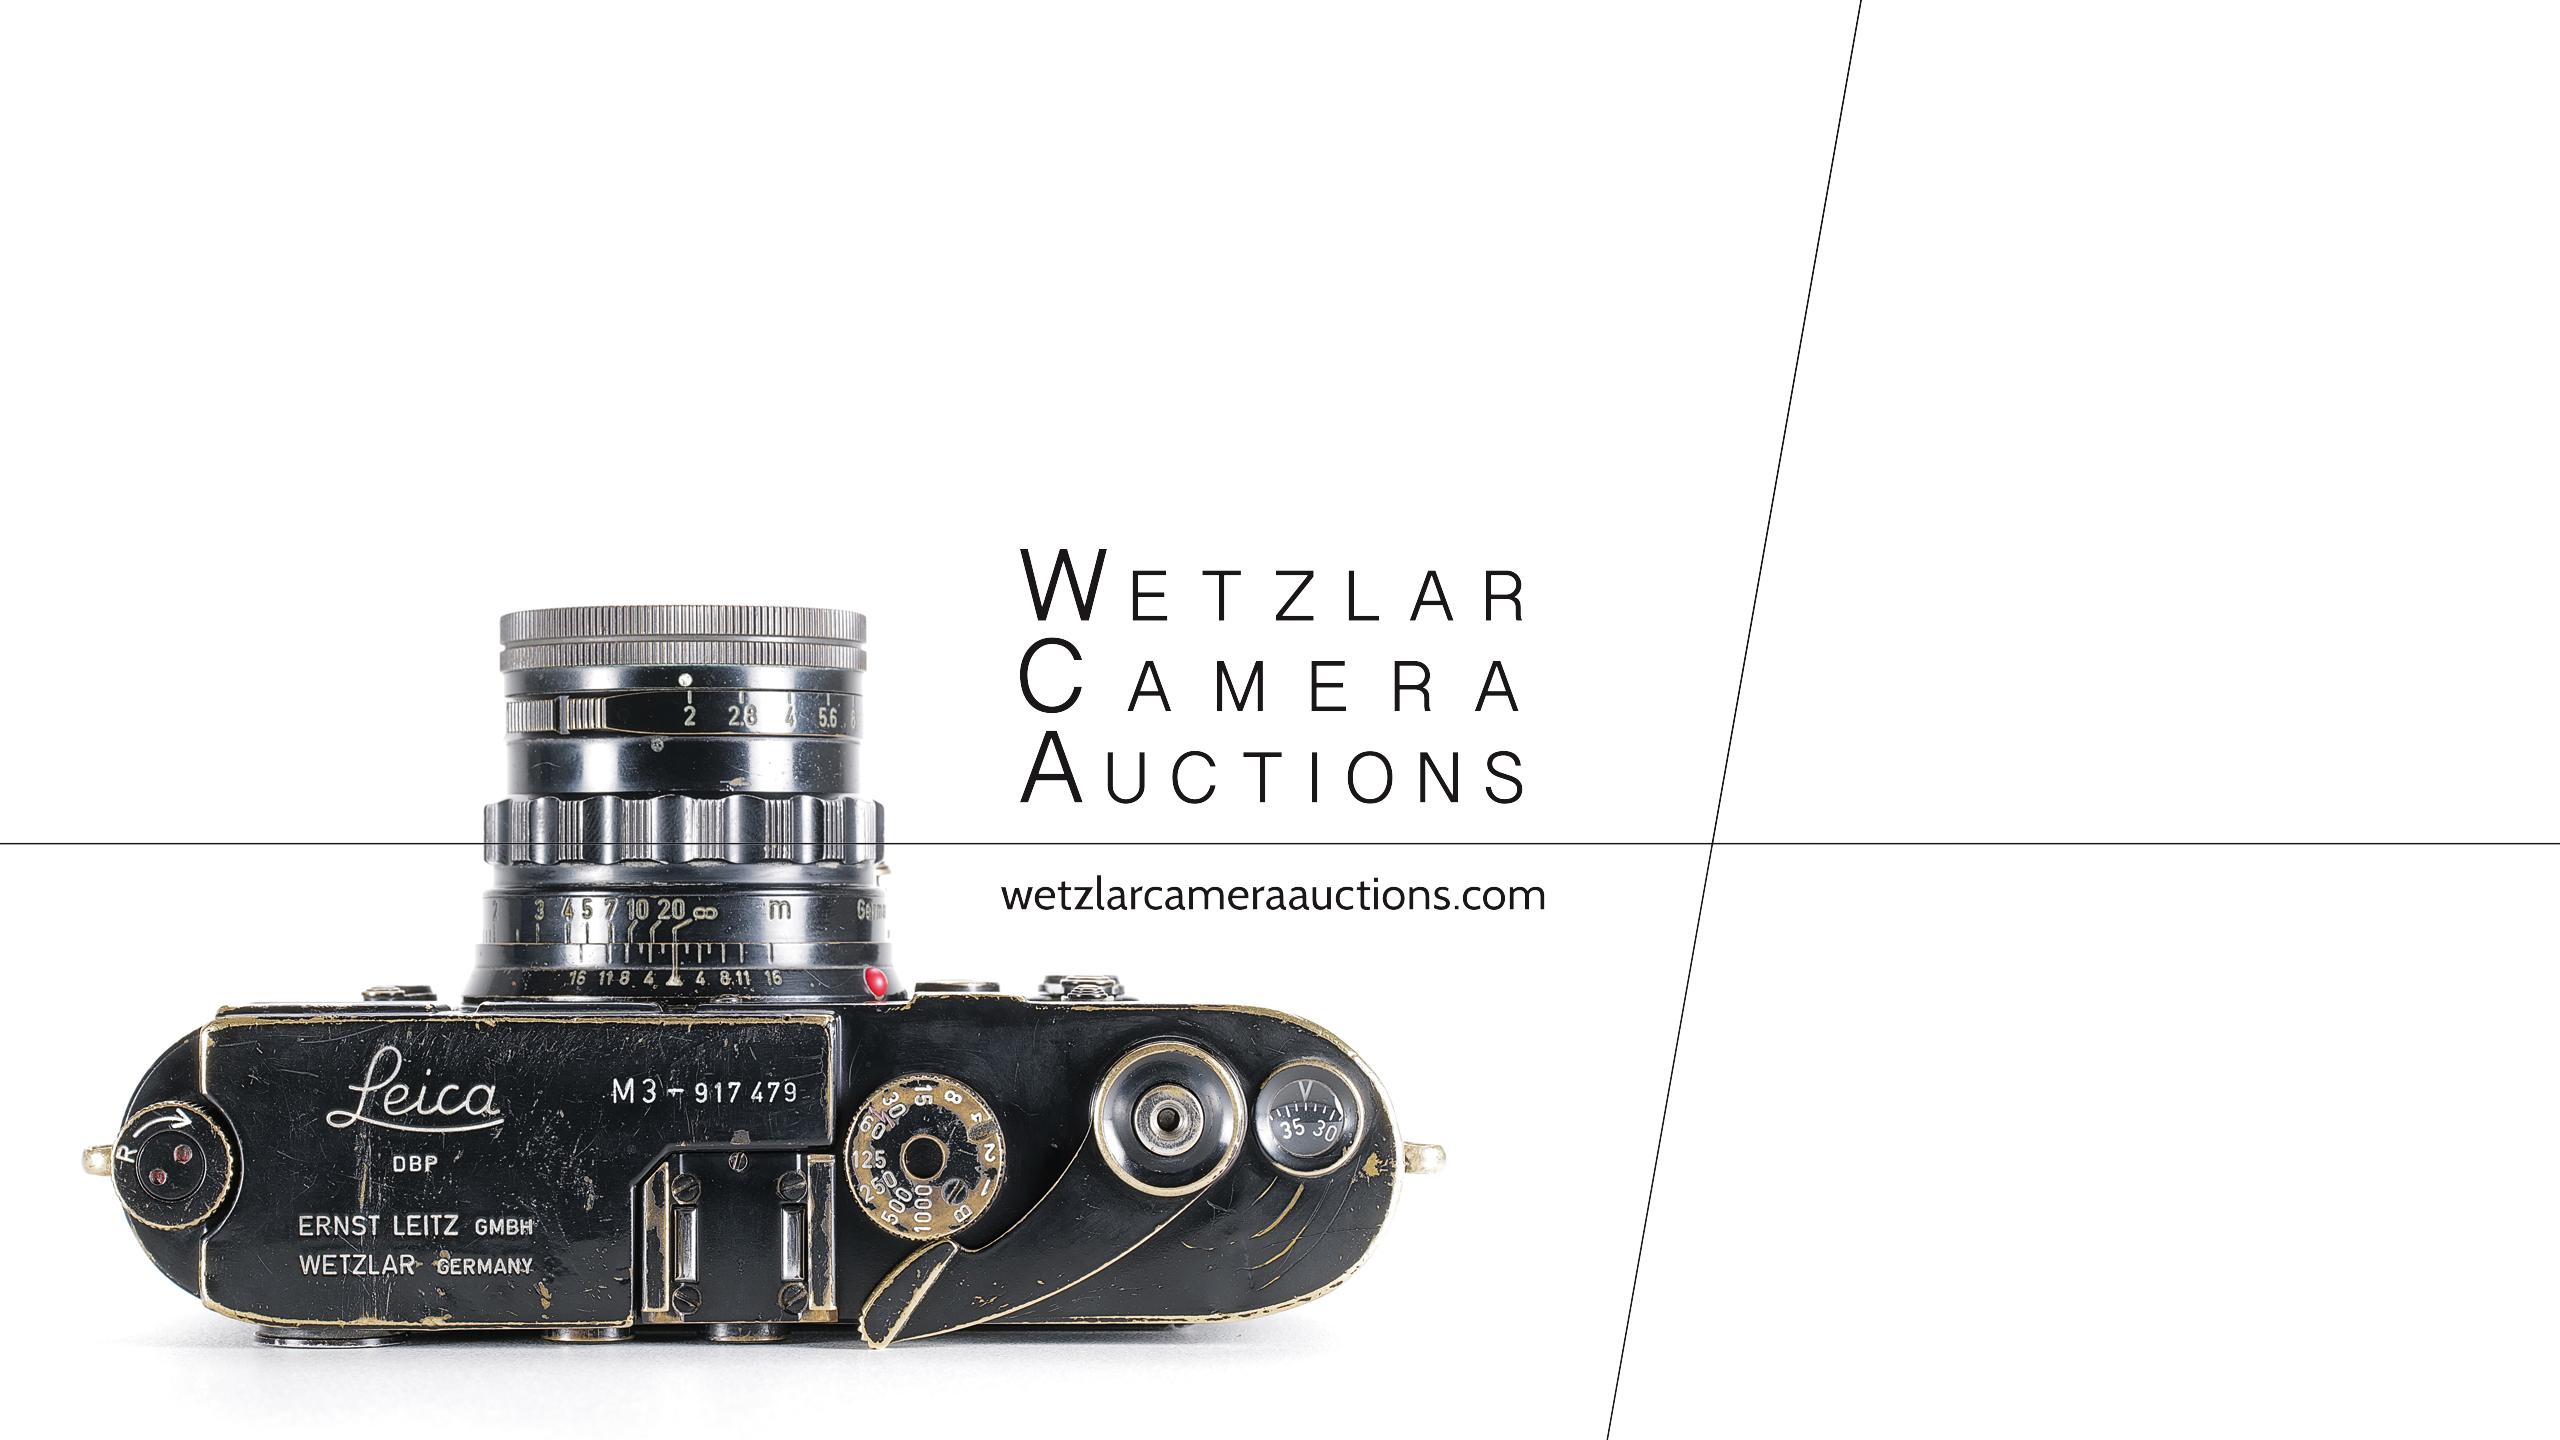 Wetzlar Camera Auctions - Leica M3 Black Paint - October 09th 2021